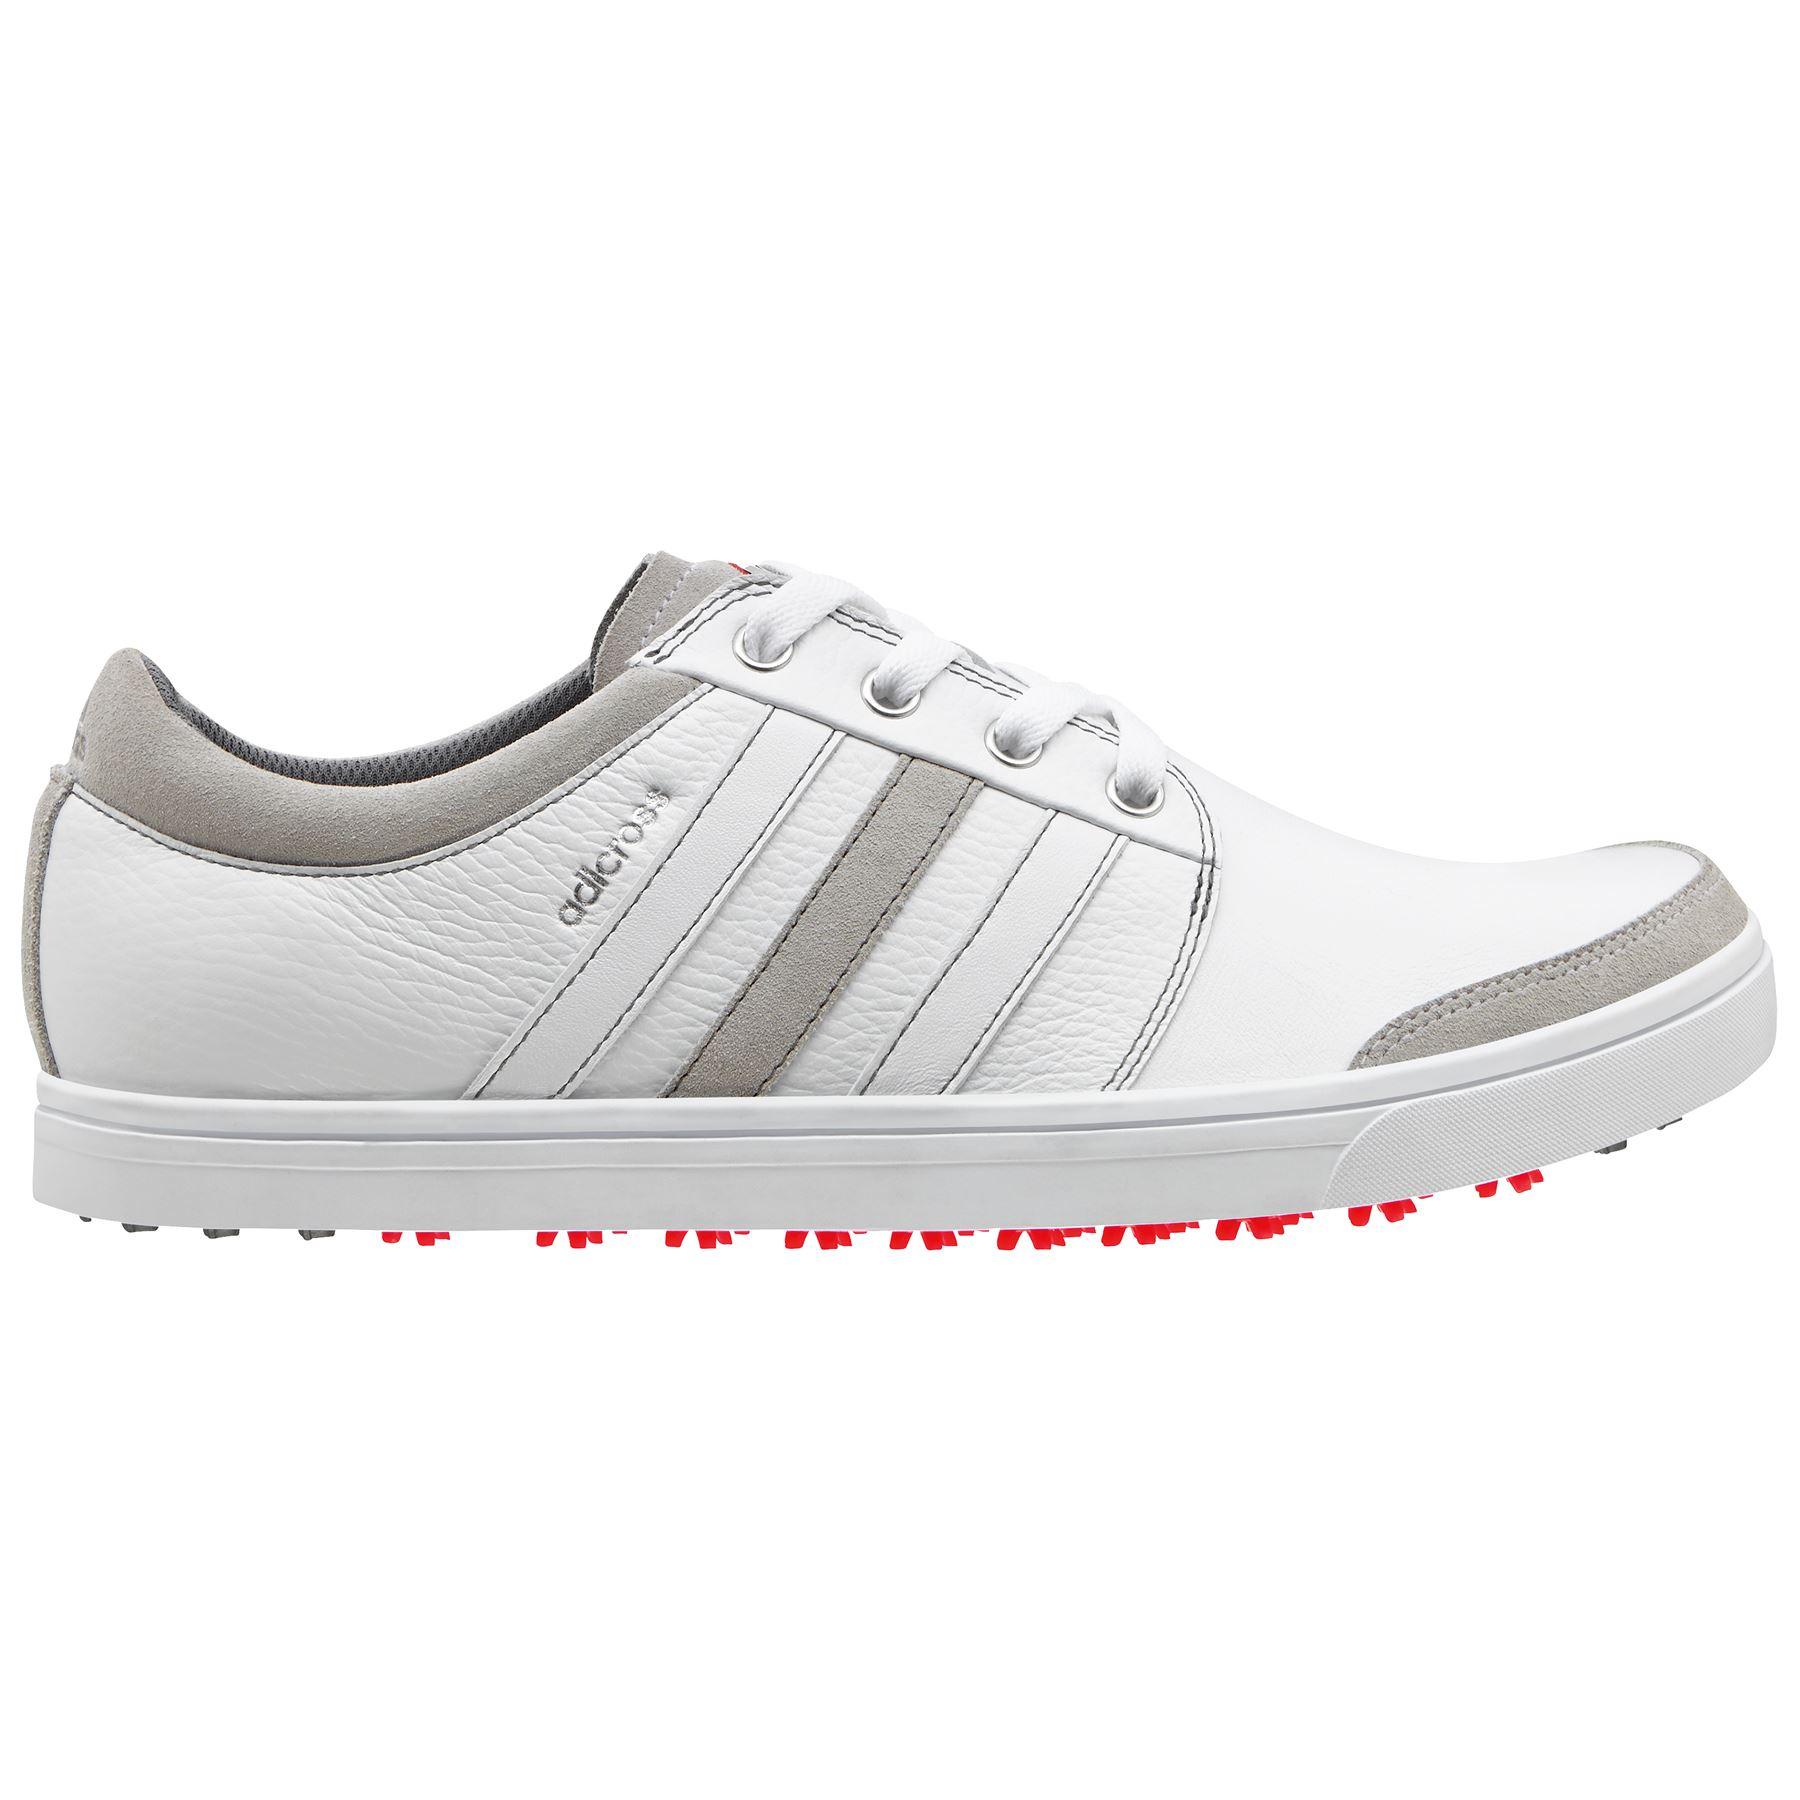 sale43 off adidas adicross gripmore spikeless